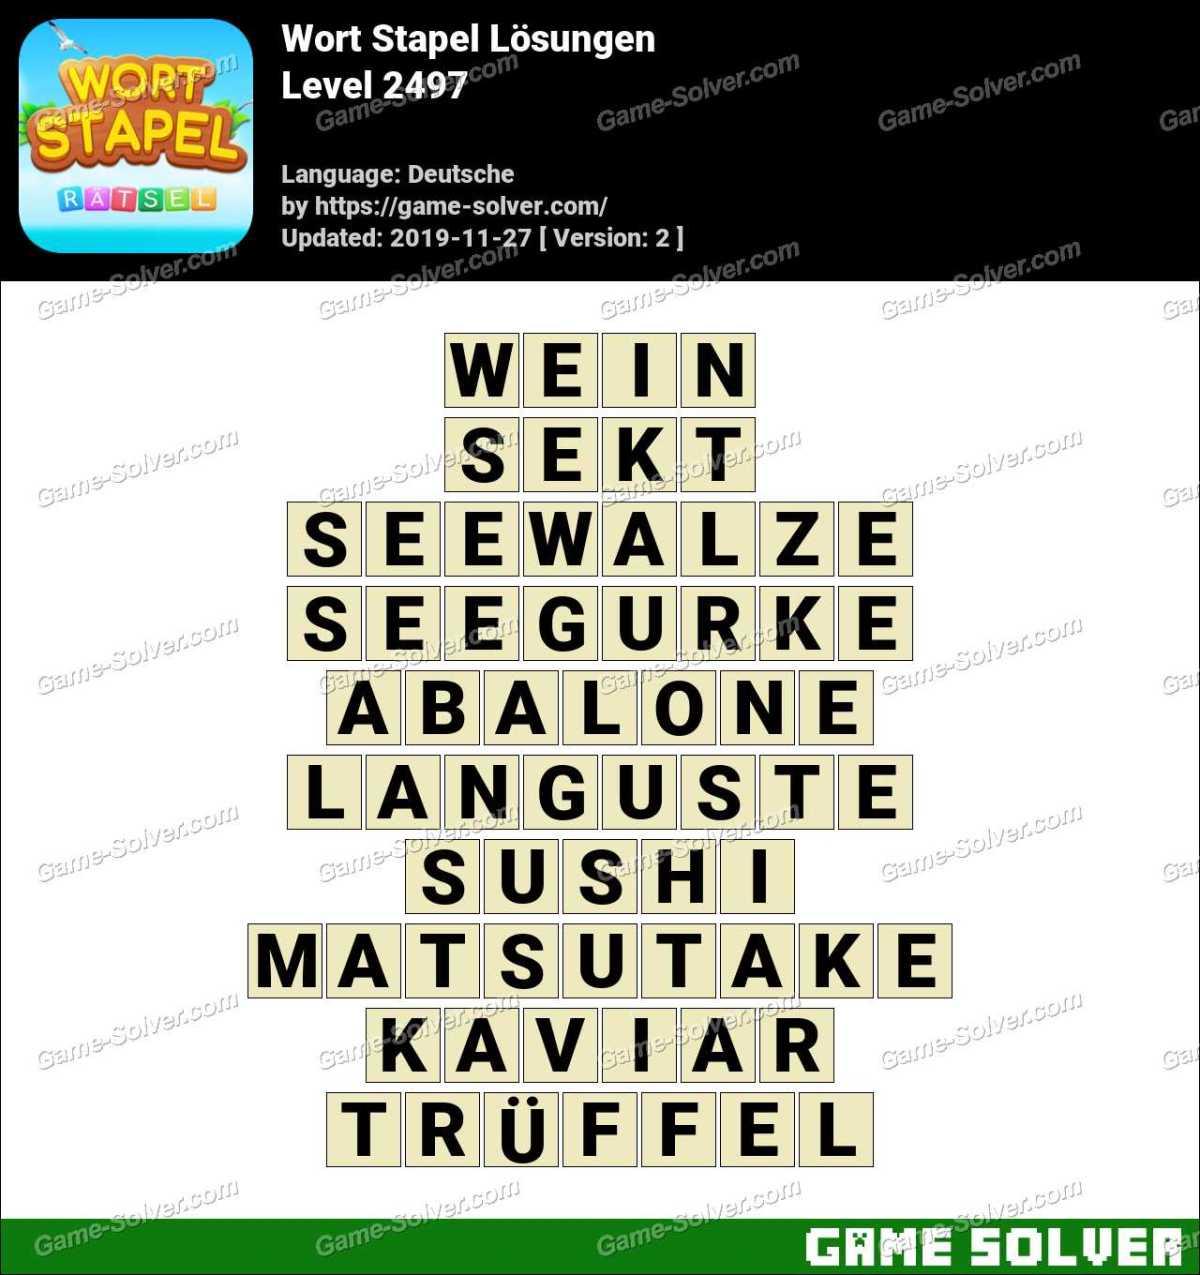 Wort Stapel Level 2497 Lösungen